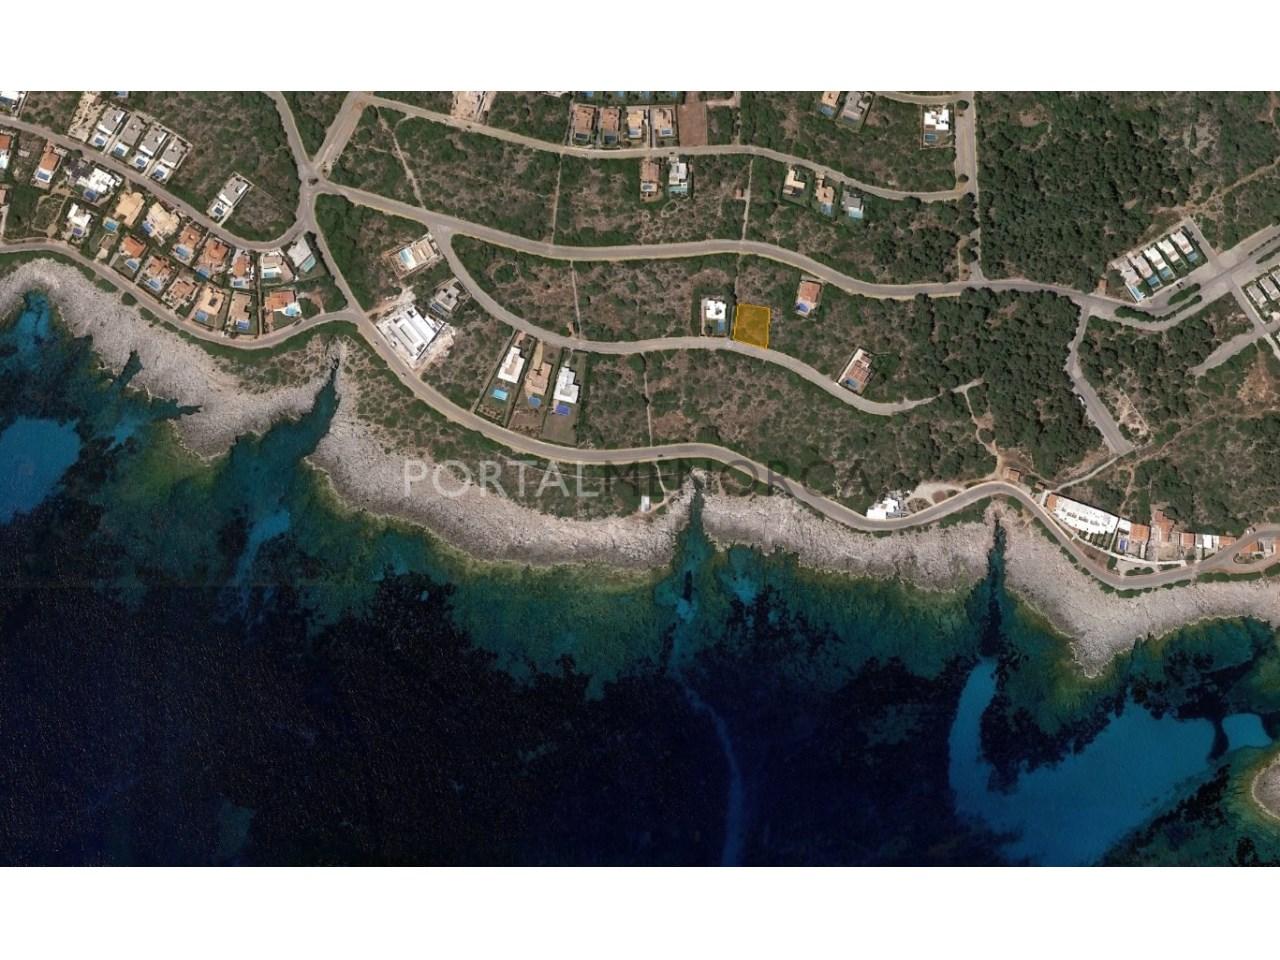 Parcela cerca del mar en venta en Torret de Baix